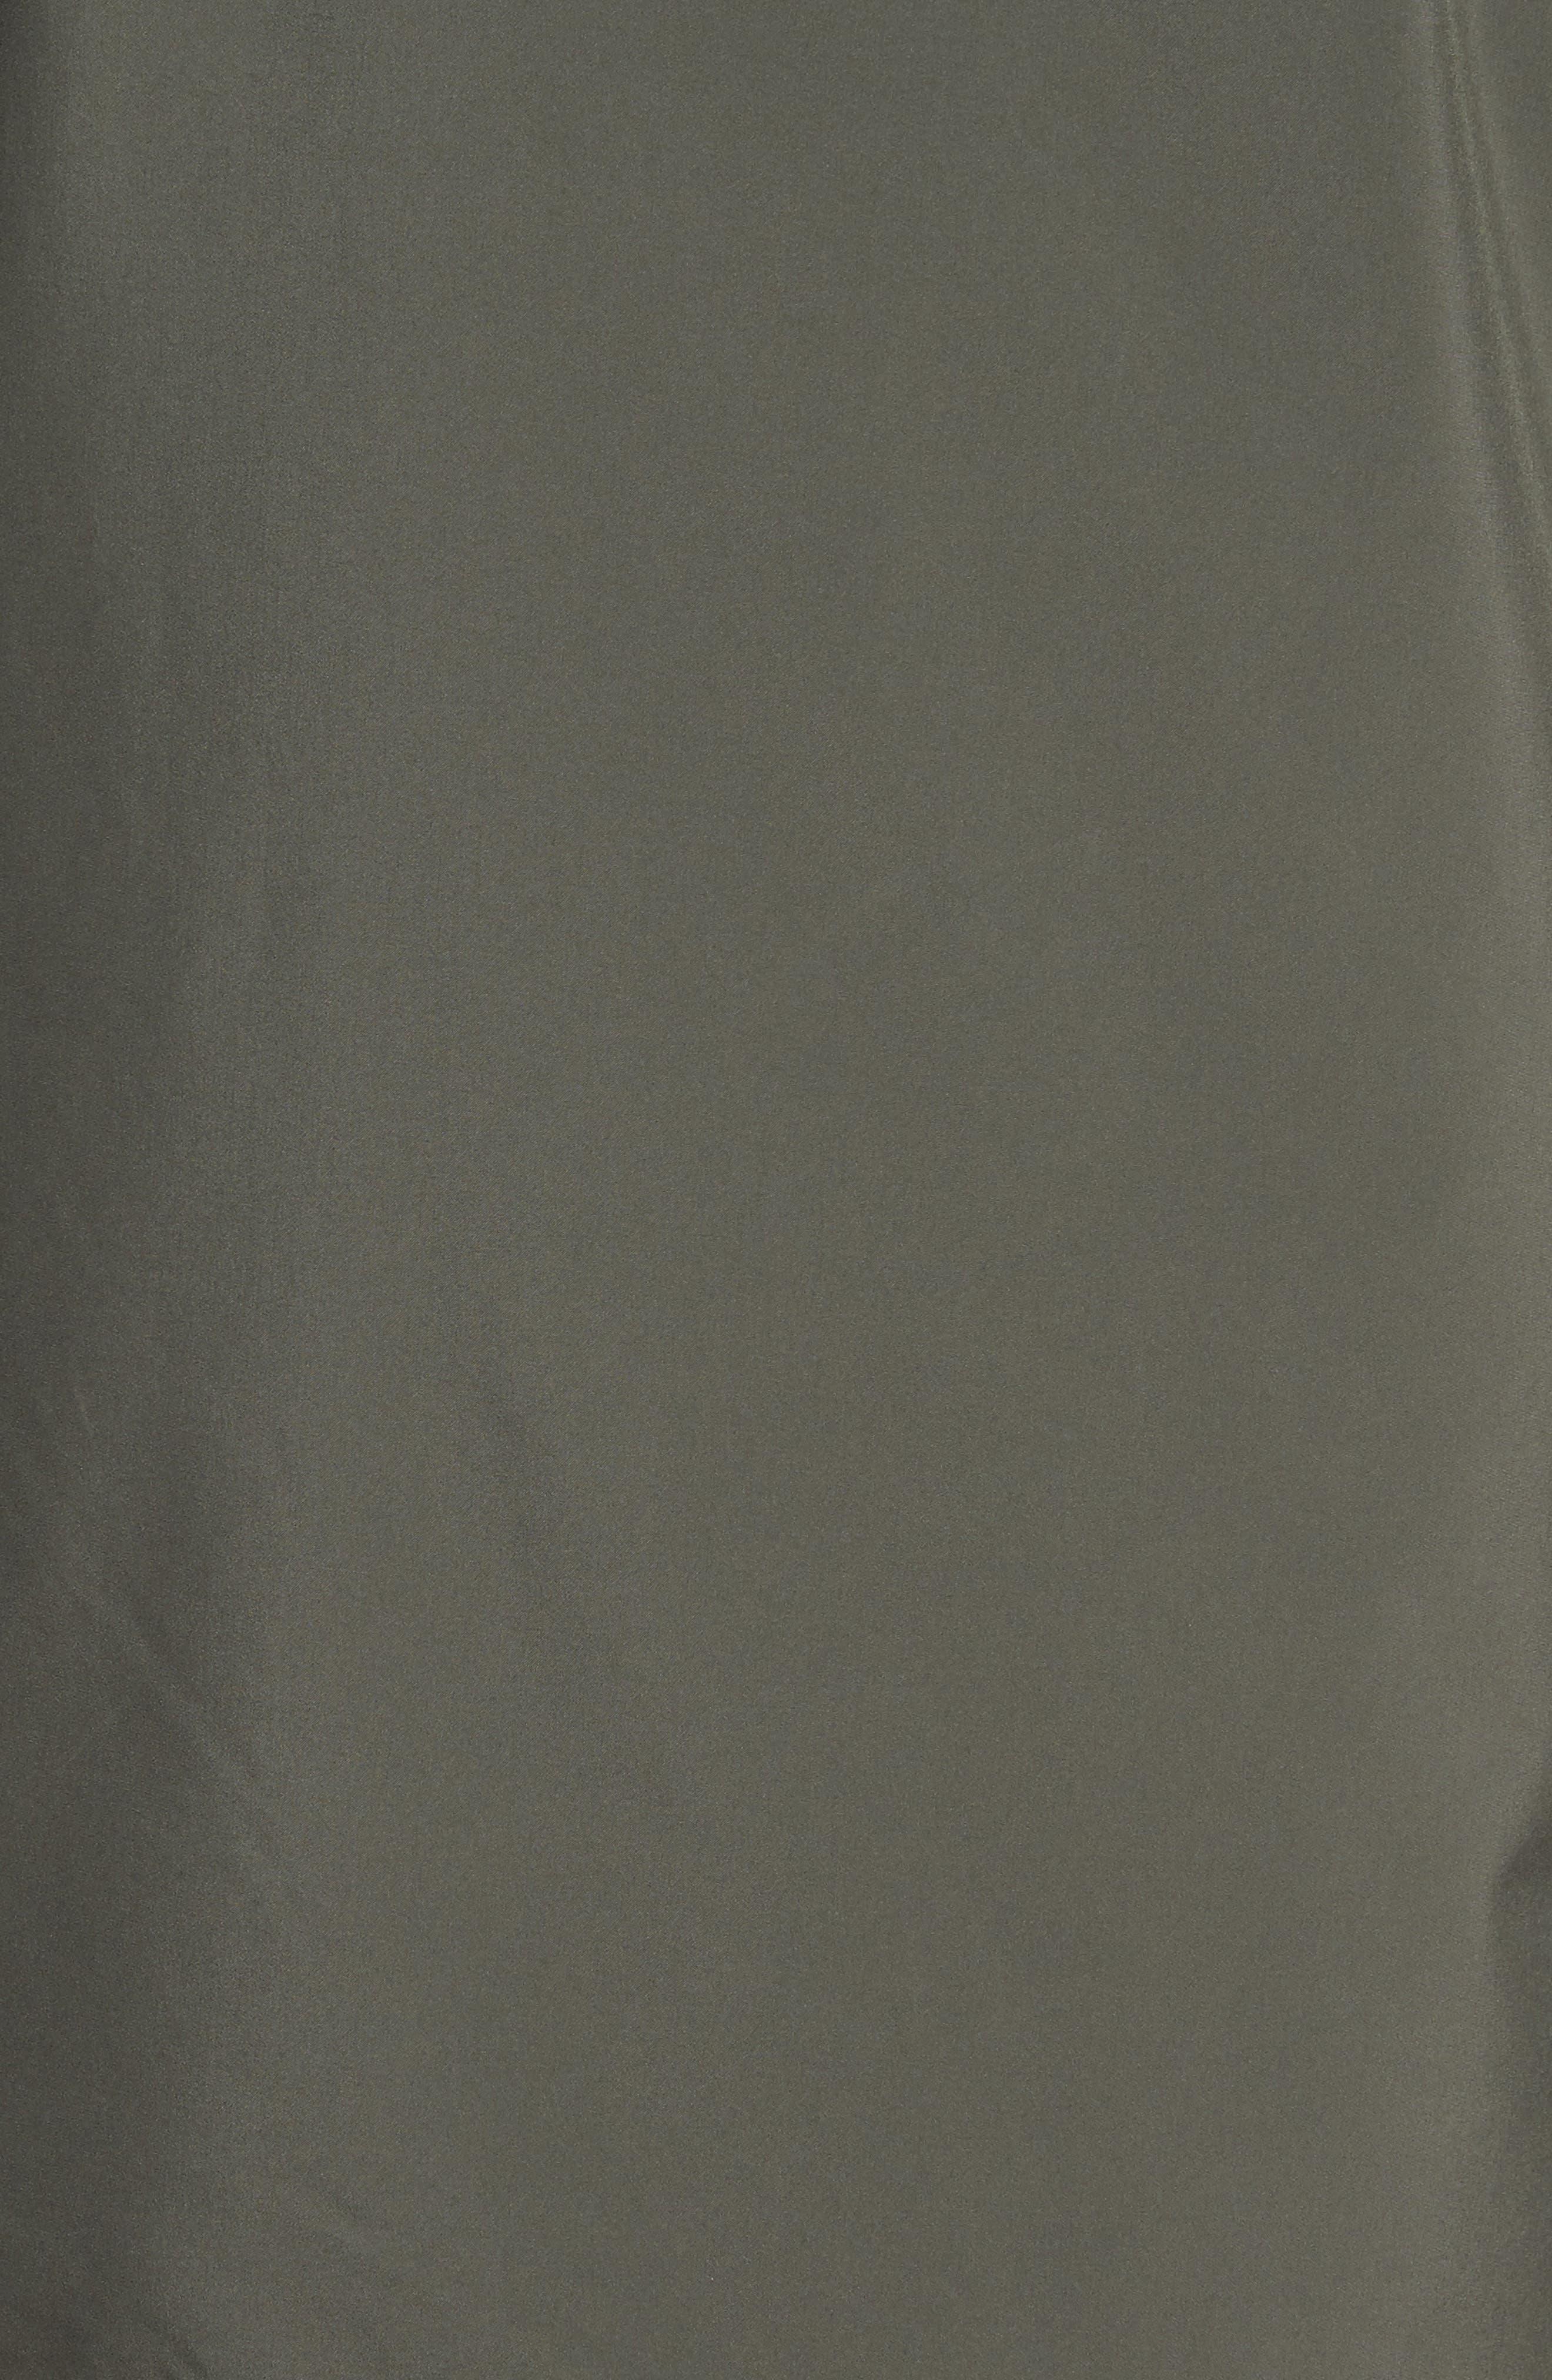 & Bros. Navigator Field Jacket,                             Alternate thumbnail 6, color,                             382